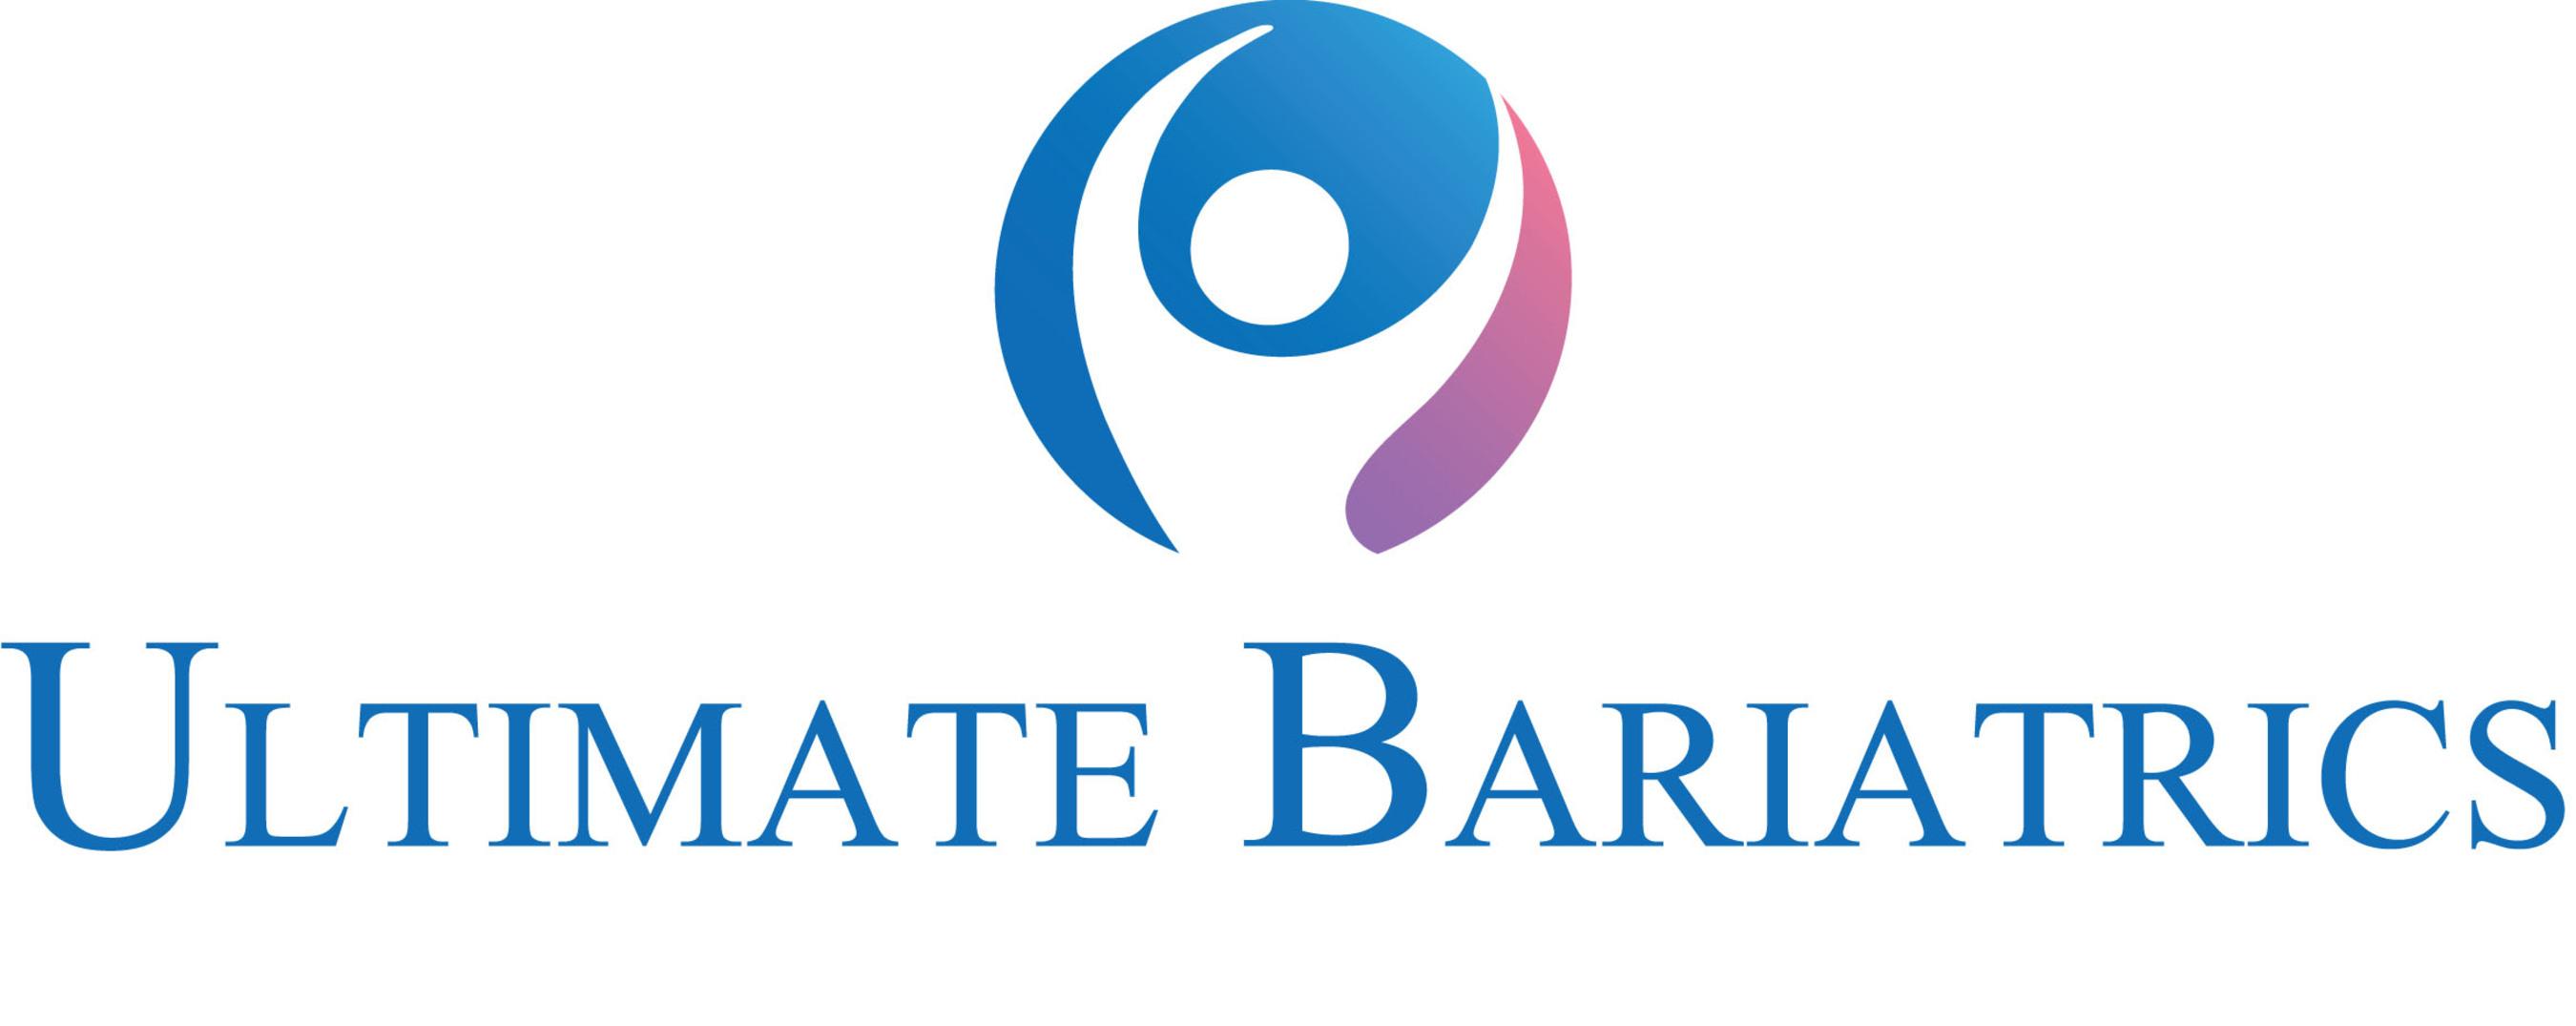 FDA Approves ORBERA™ Bariatric System. Apollo Endosurgery Names Dr. Adam Smith Spokesperson.